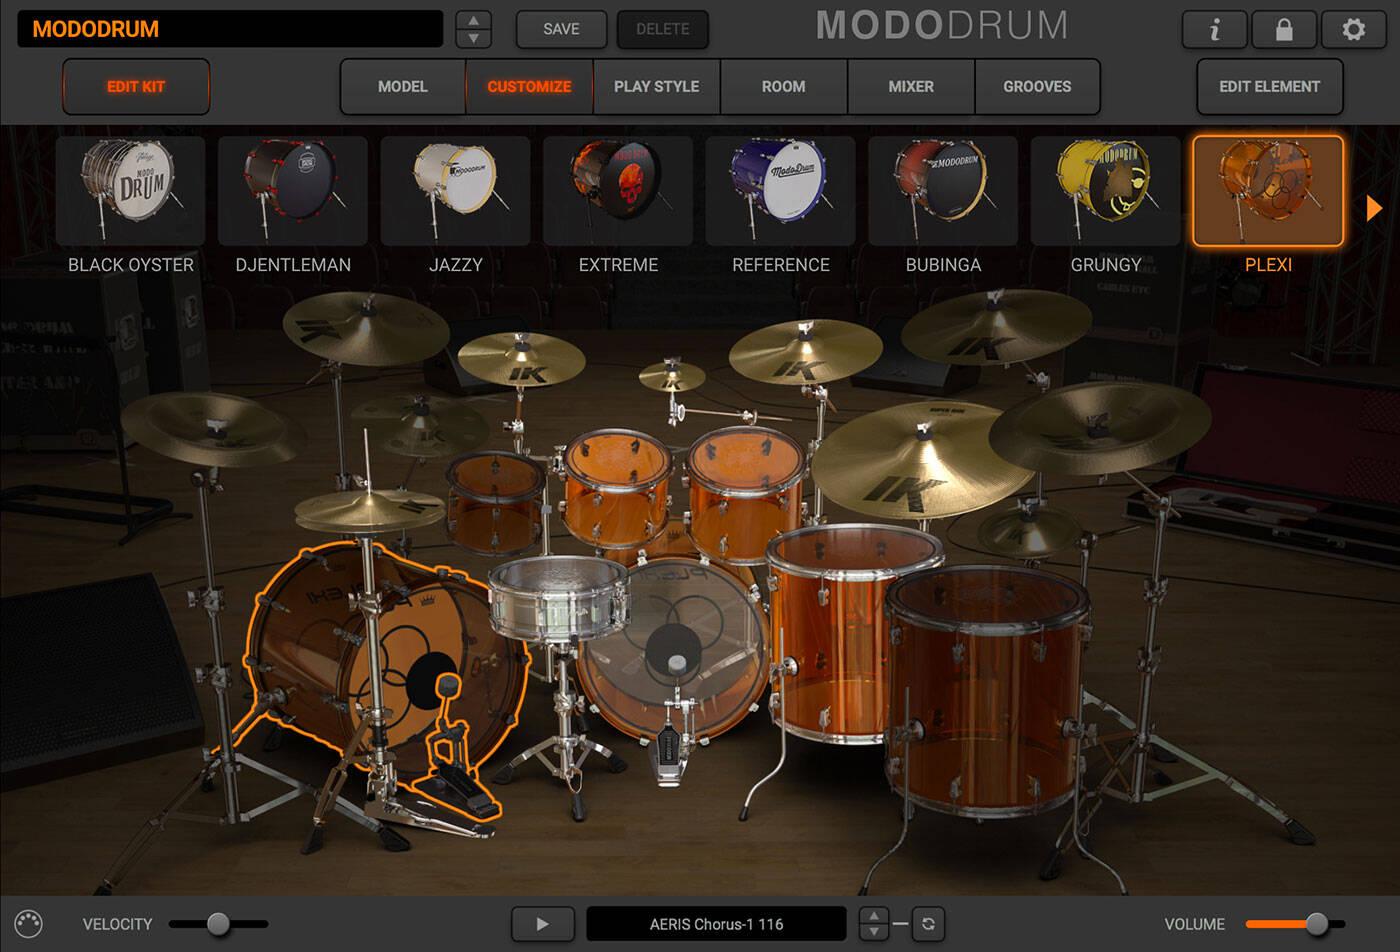 modo_drum_customize_edit_kit_plexi